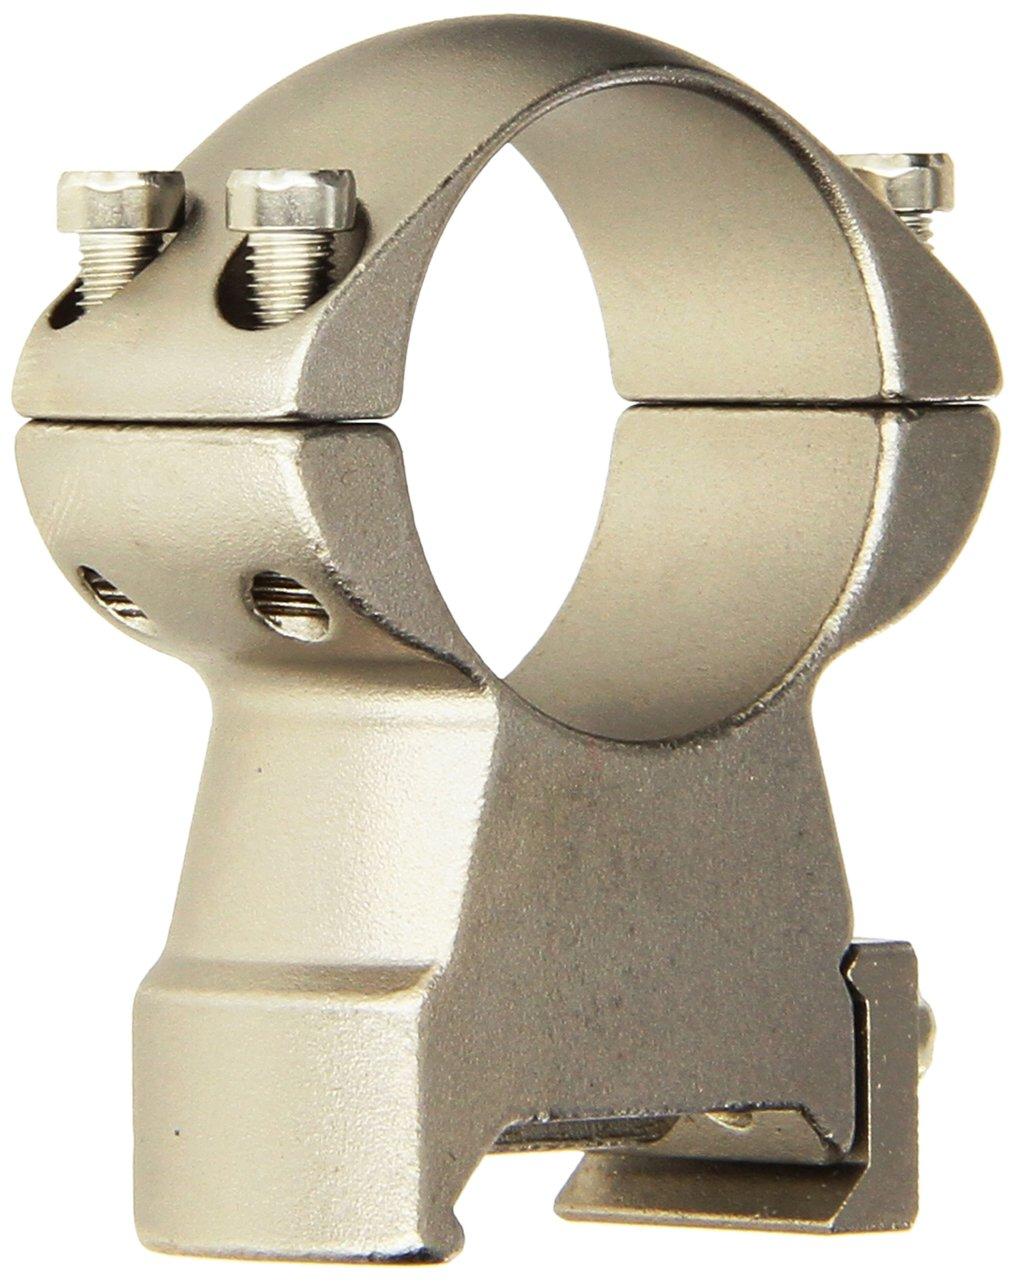 WEAVER 49323, Grand Slam Steel Rings, 1'', X-High, Silver by WEAVER